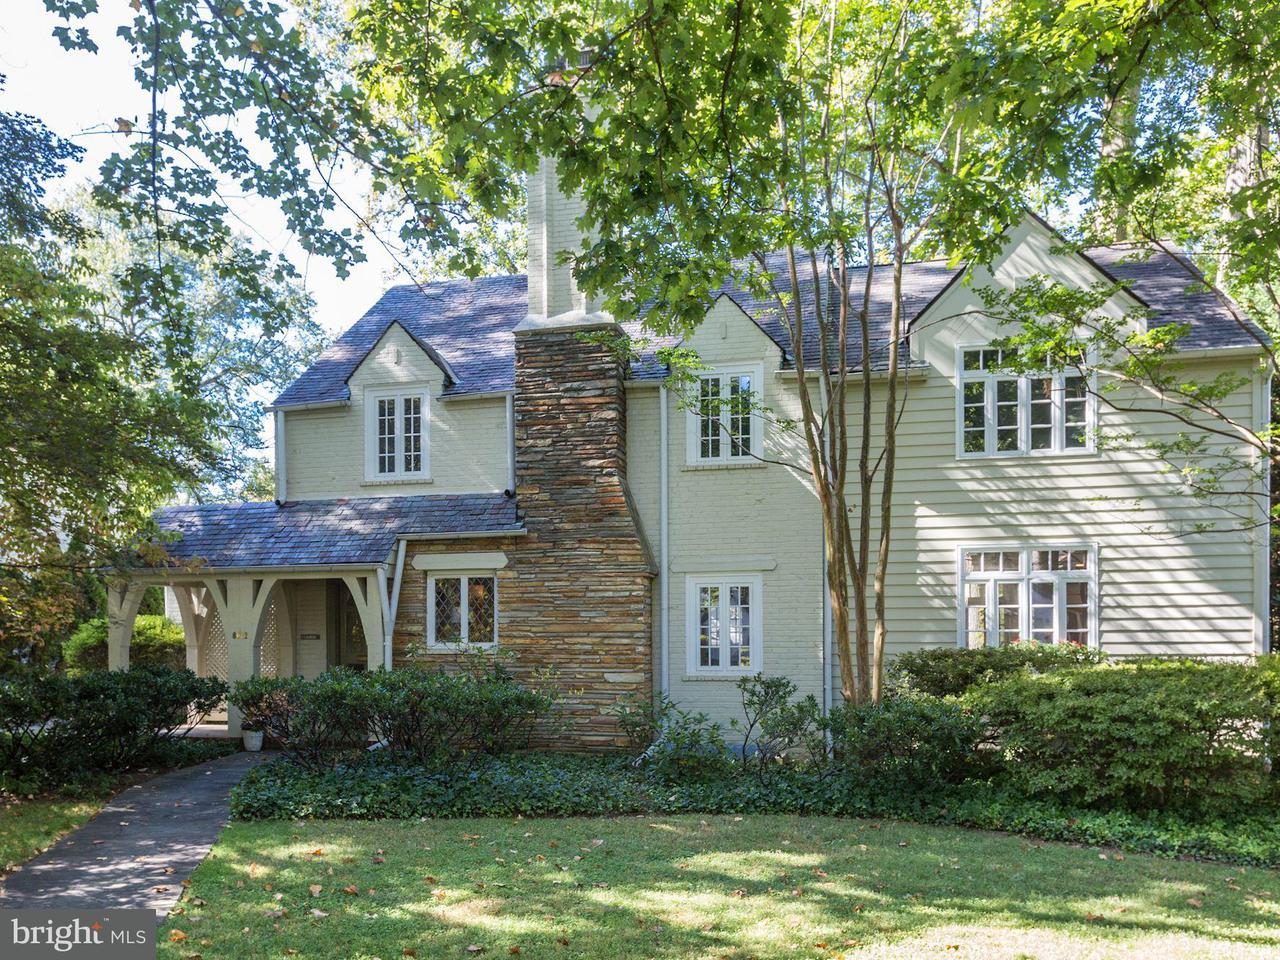 Single Family Home for Sale at 8012 Hampden Lane 8012 Hampden Lane Bethesda, Maryland 20814 United States